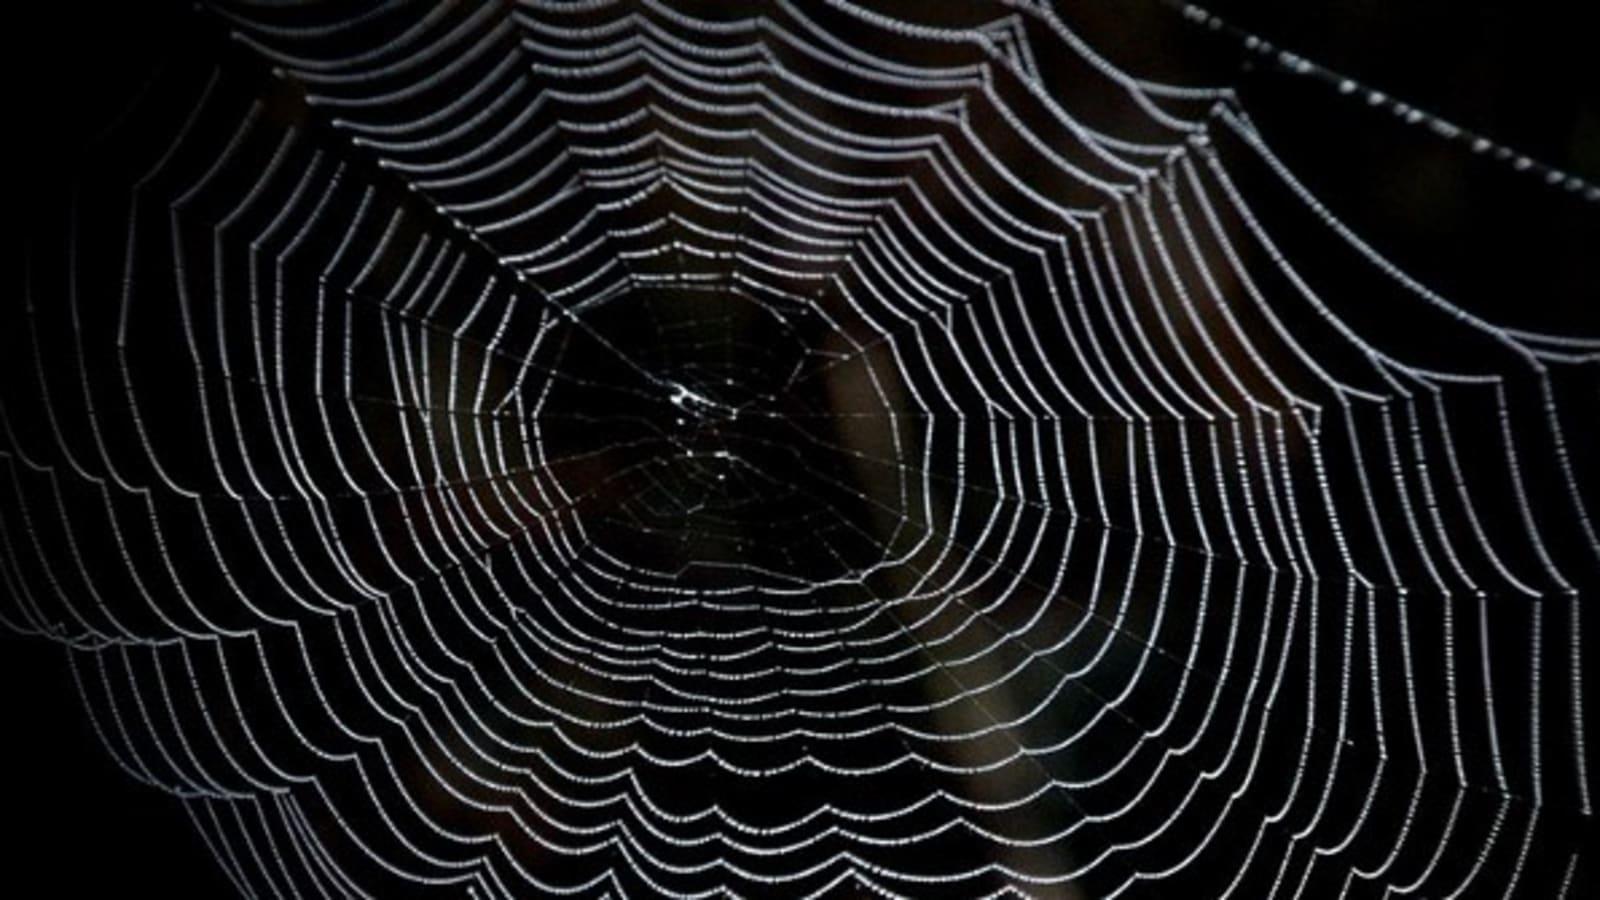 The Deep Dark Web Dev